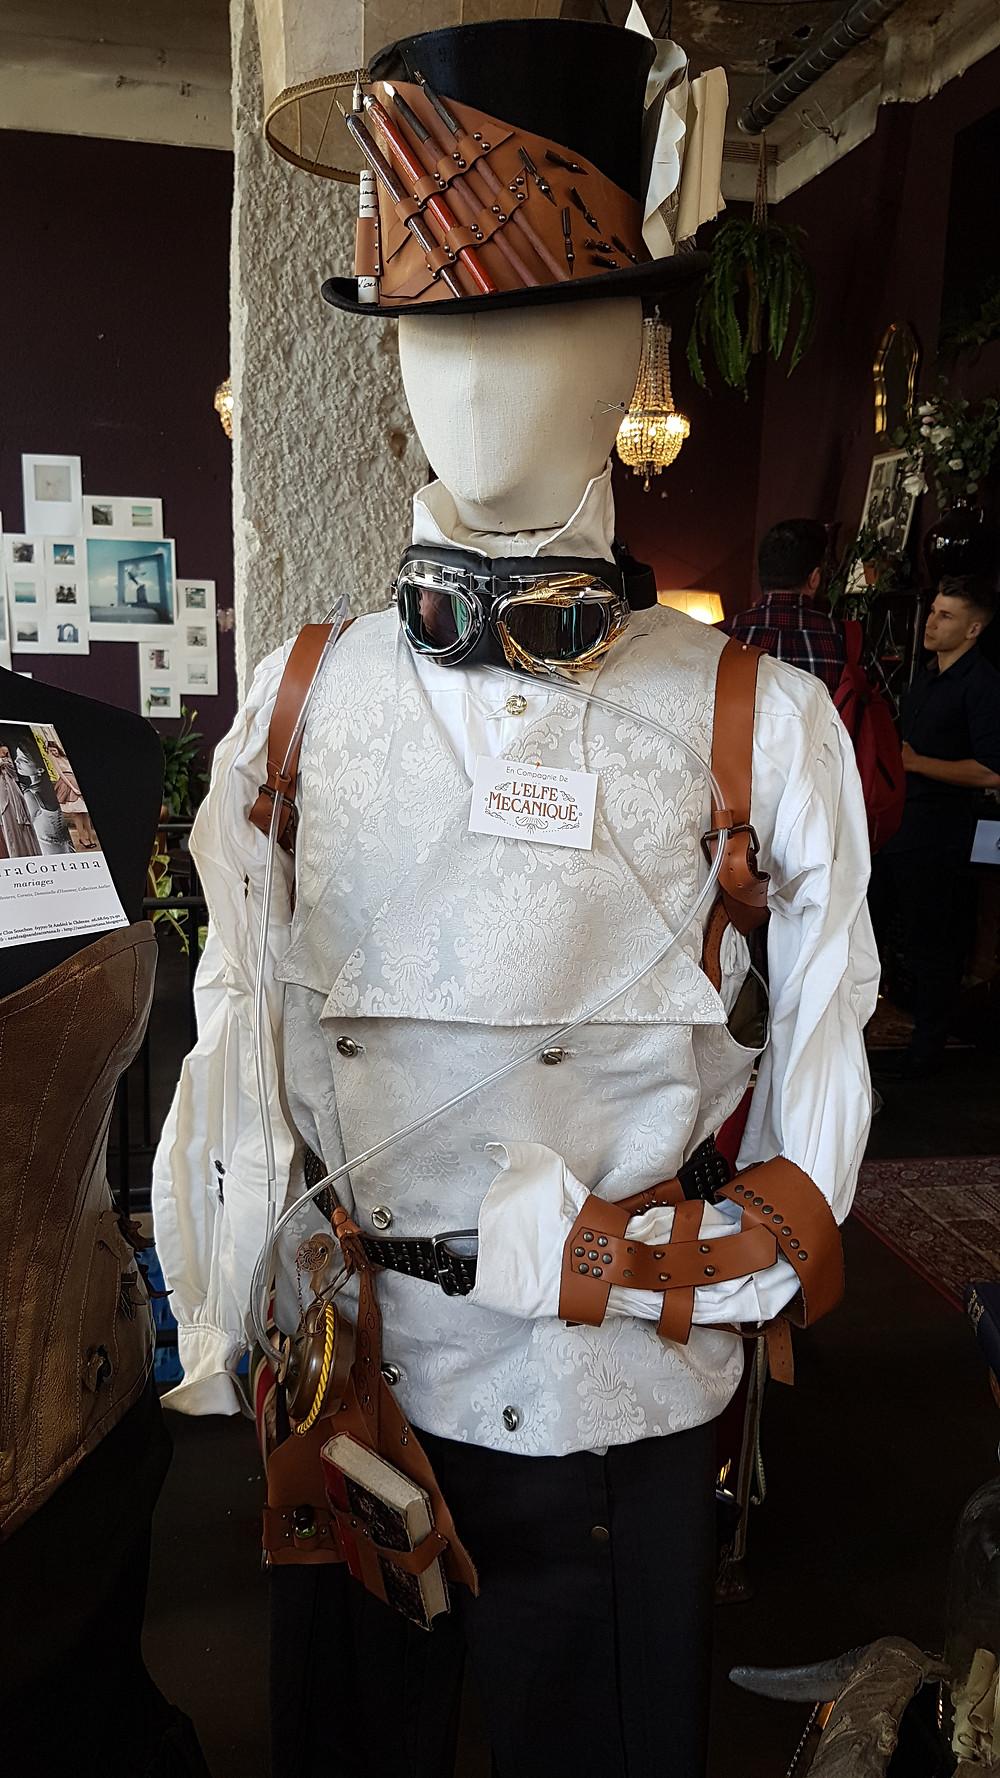 costume mariage steampunk, mariage alternatif, costume mariage atypique, sur-mesure